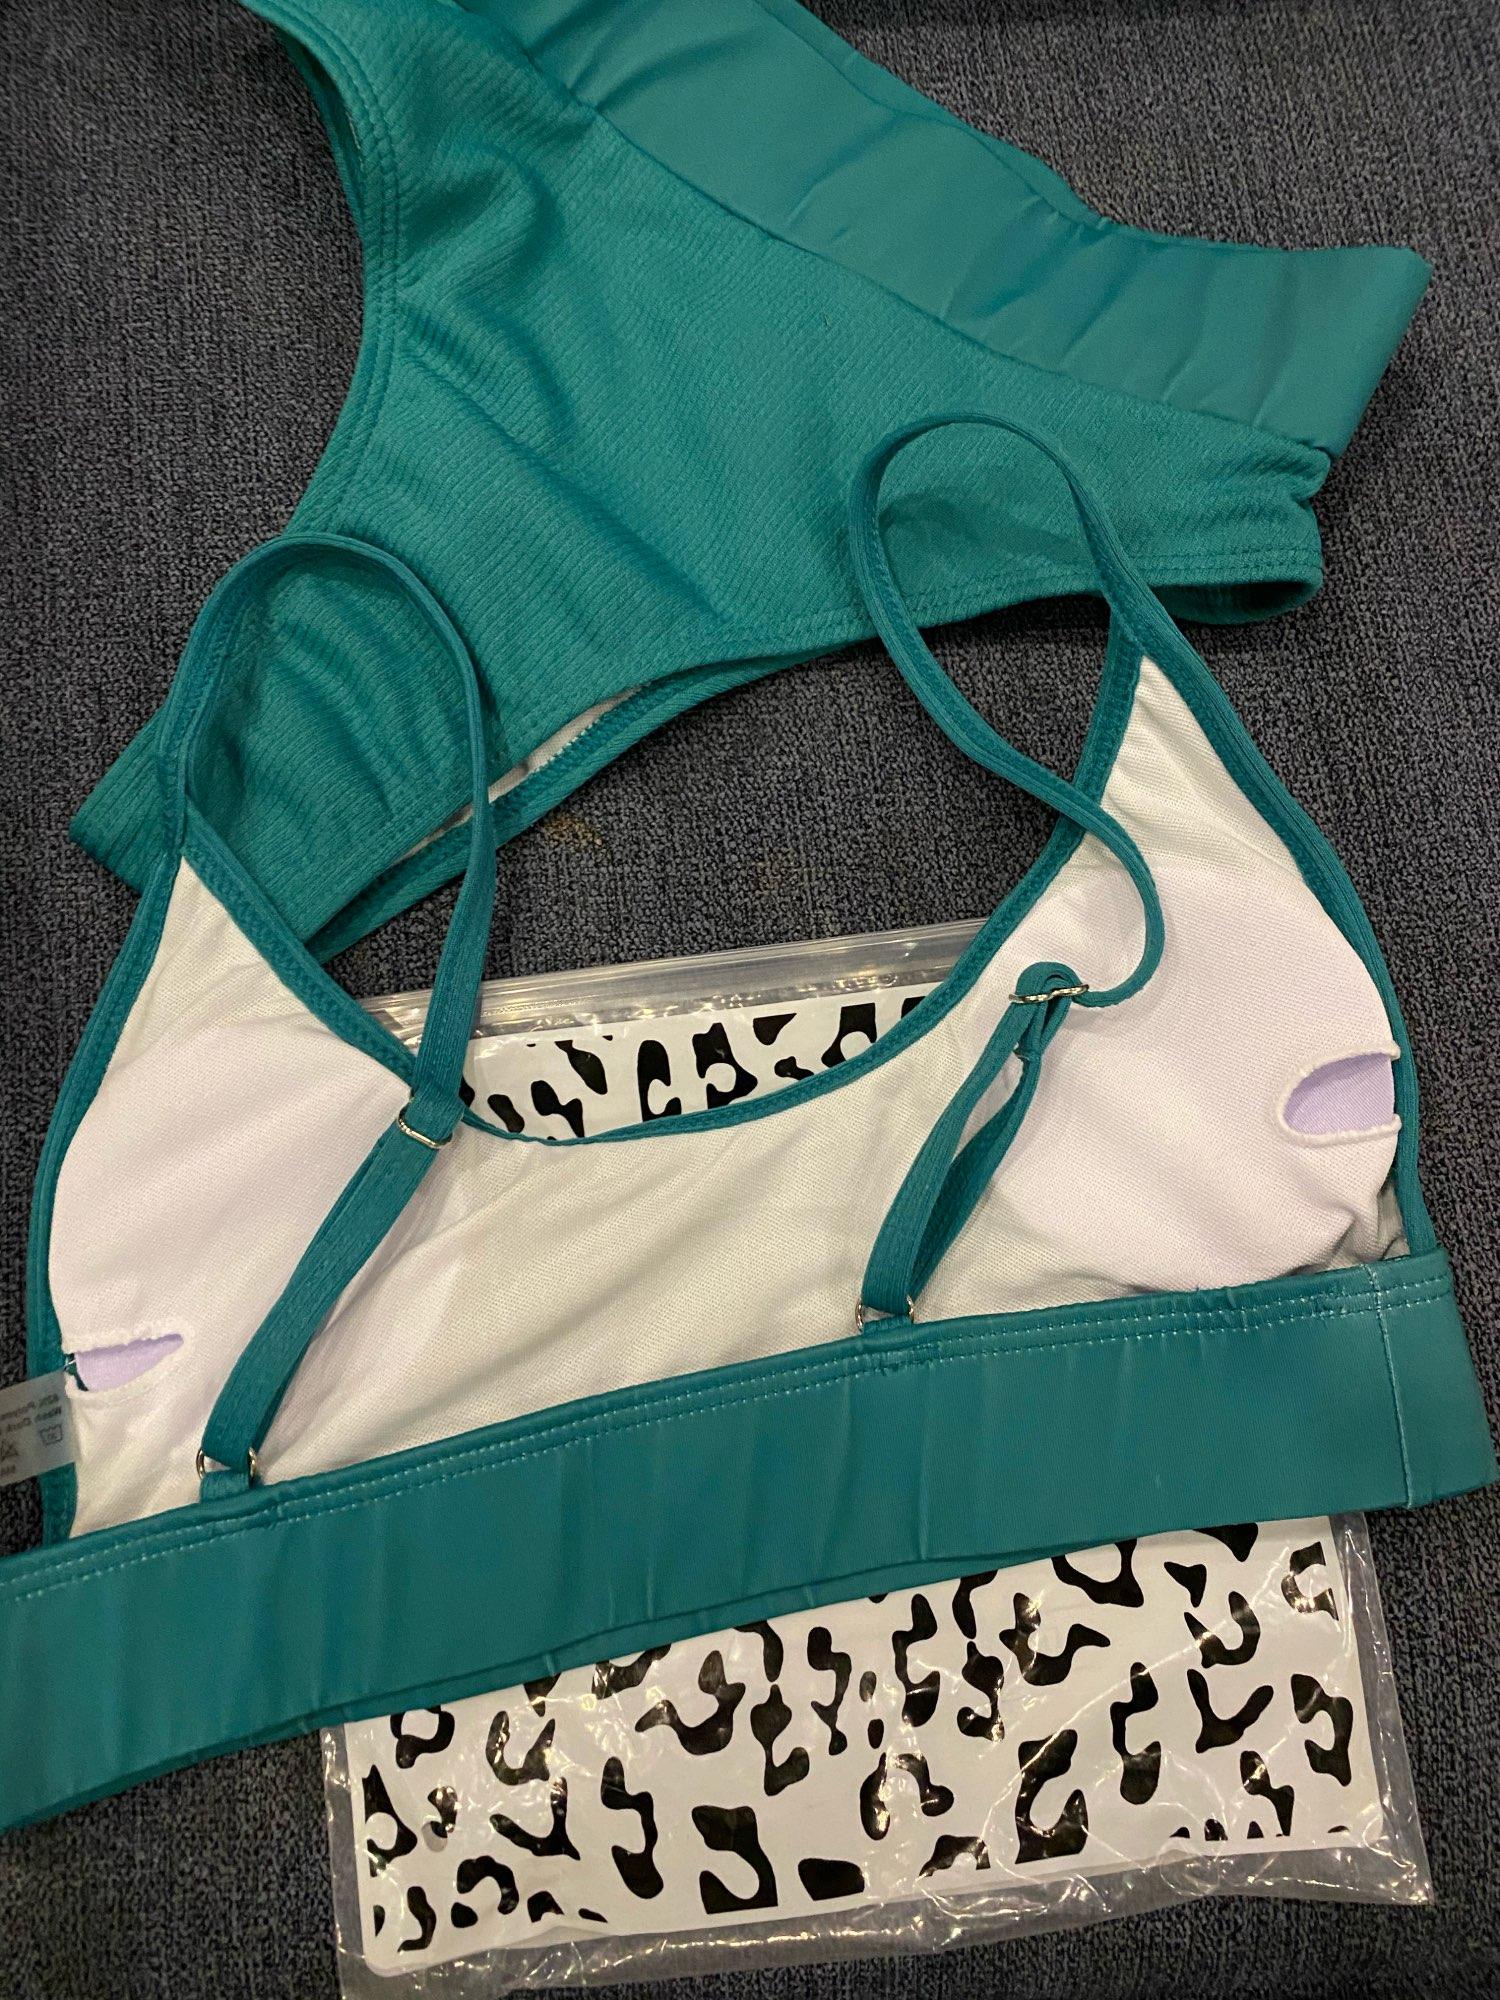 INGAGA High Waist Bikinis 2021 Swimwear Women Push Up Swimsuits Solid Brazilian Bikini Ribbed Biquini Strap Swim Bathing Suits Bikini Set    - AliExpress